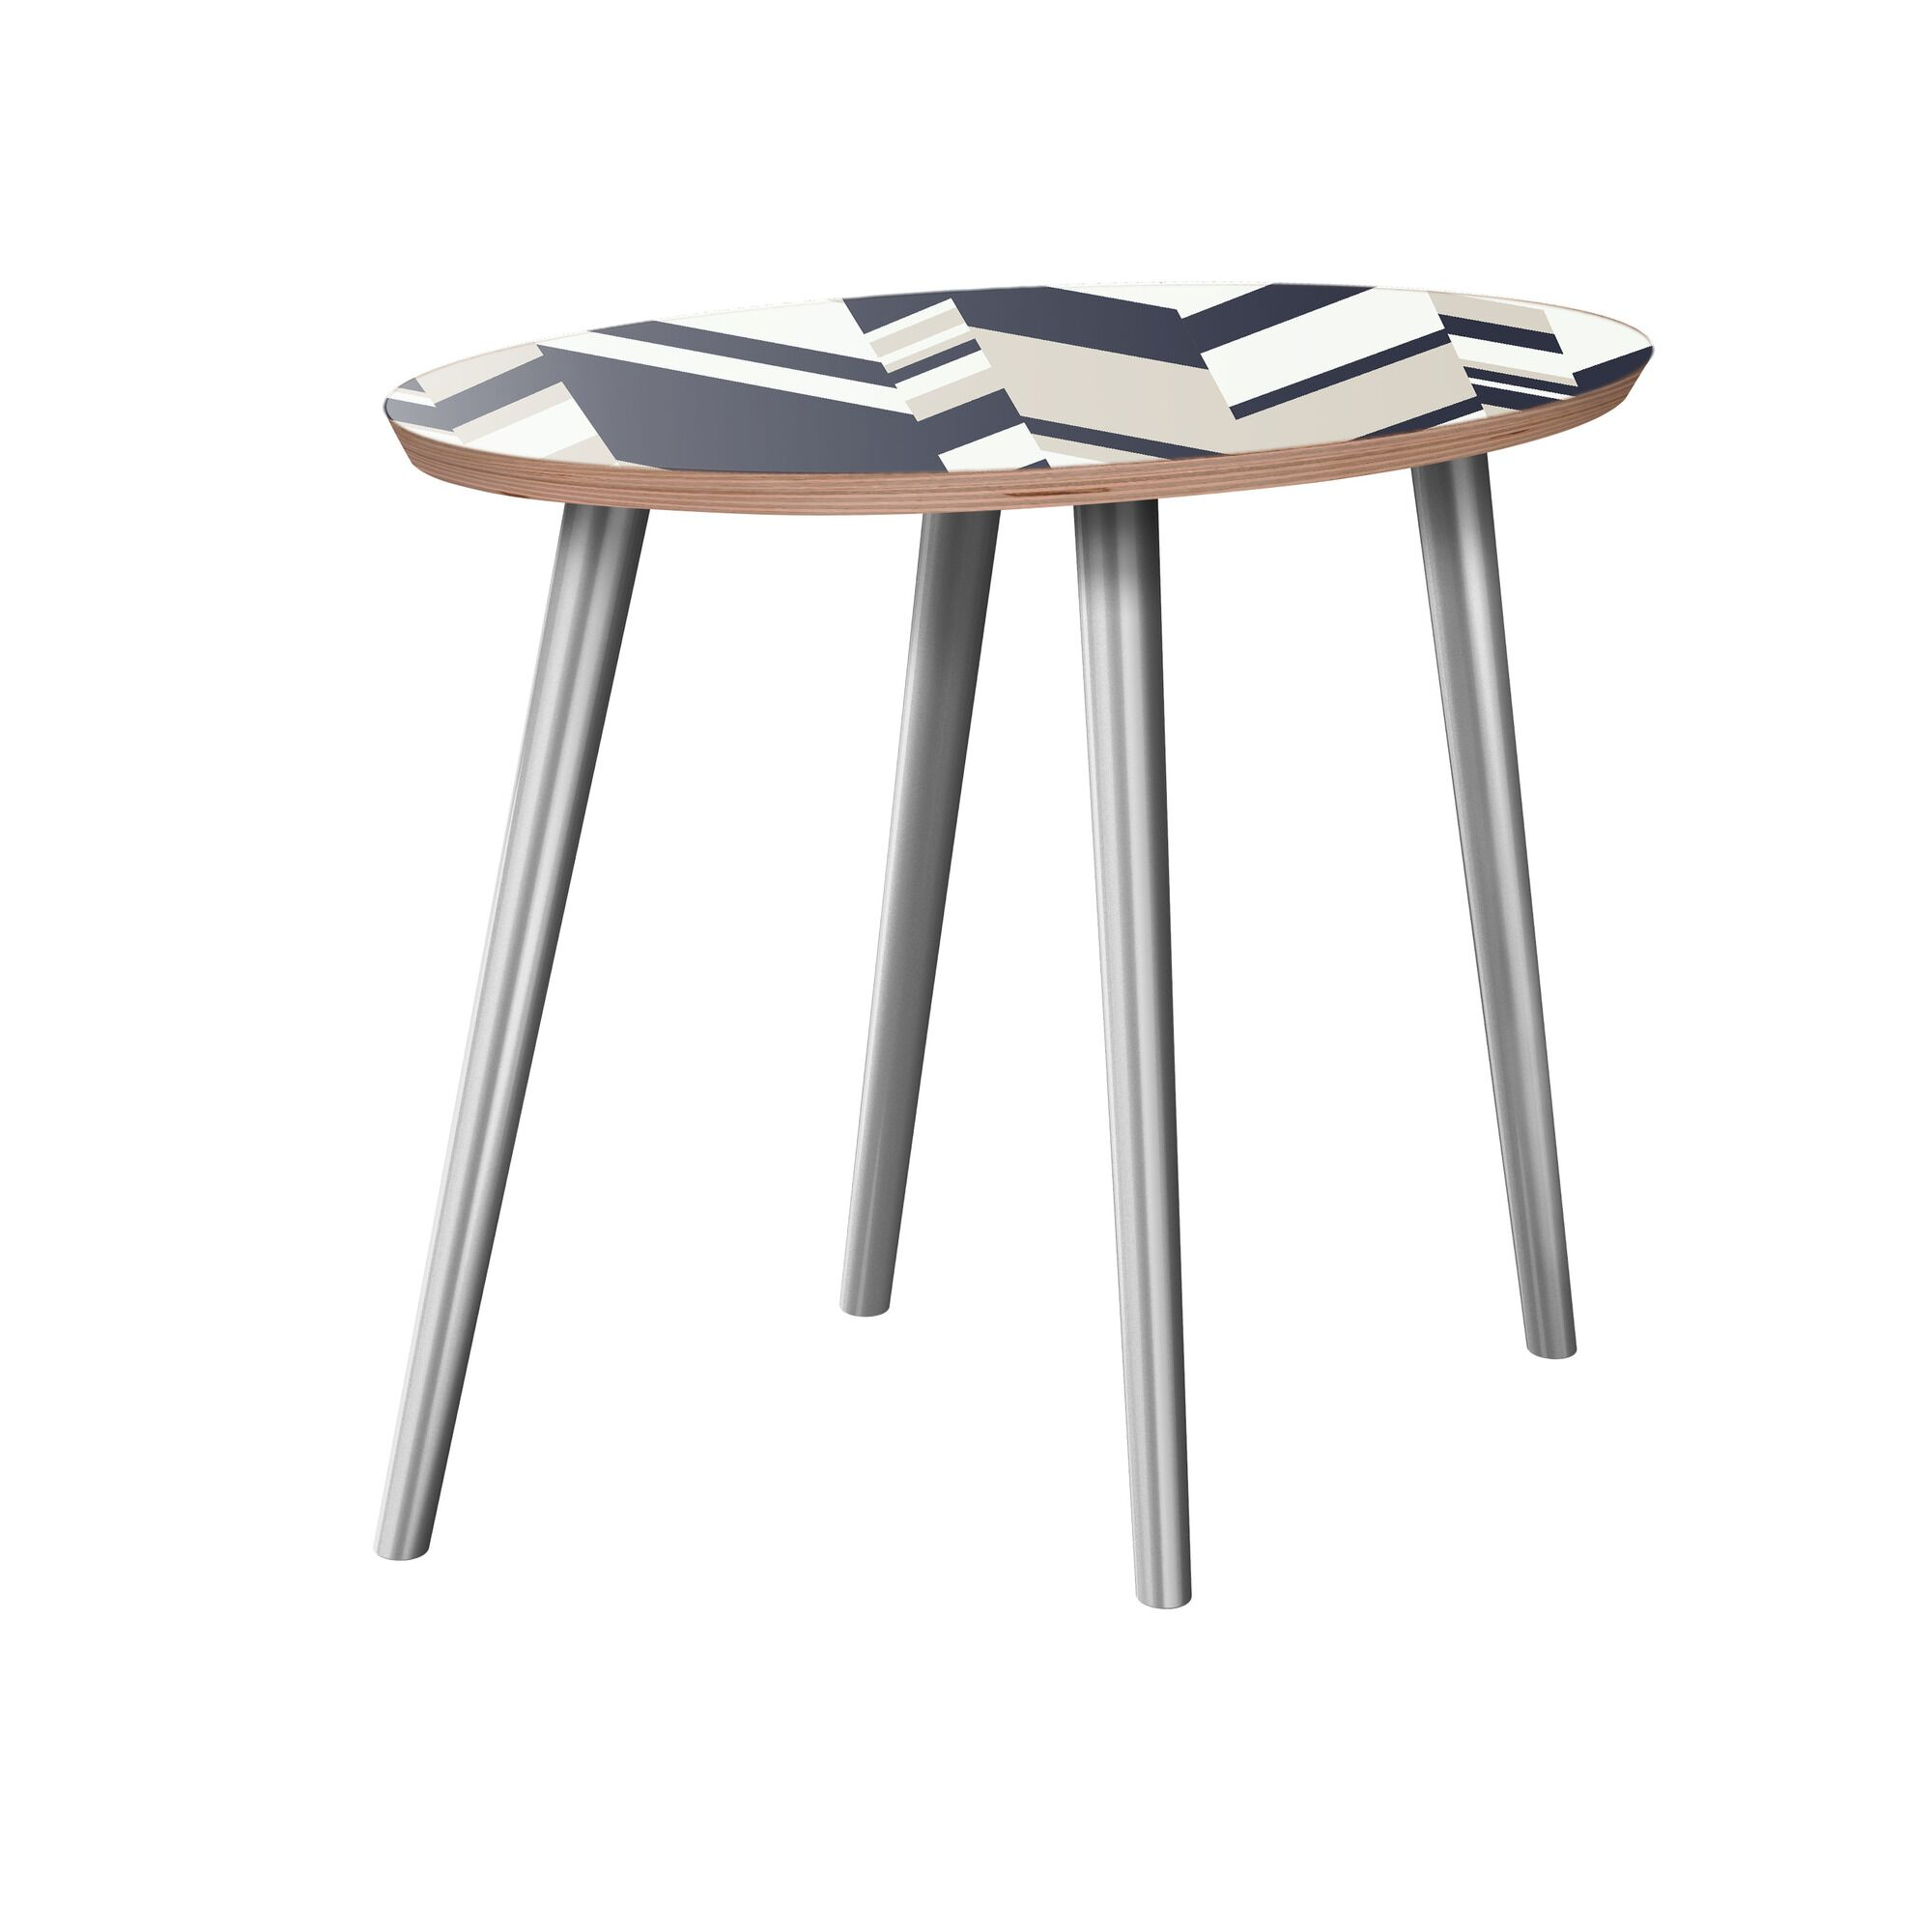 Gallman End Table Table Base Color: Chrome, Table Top Color: Walnut